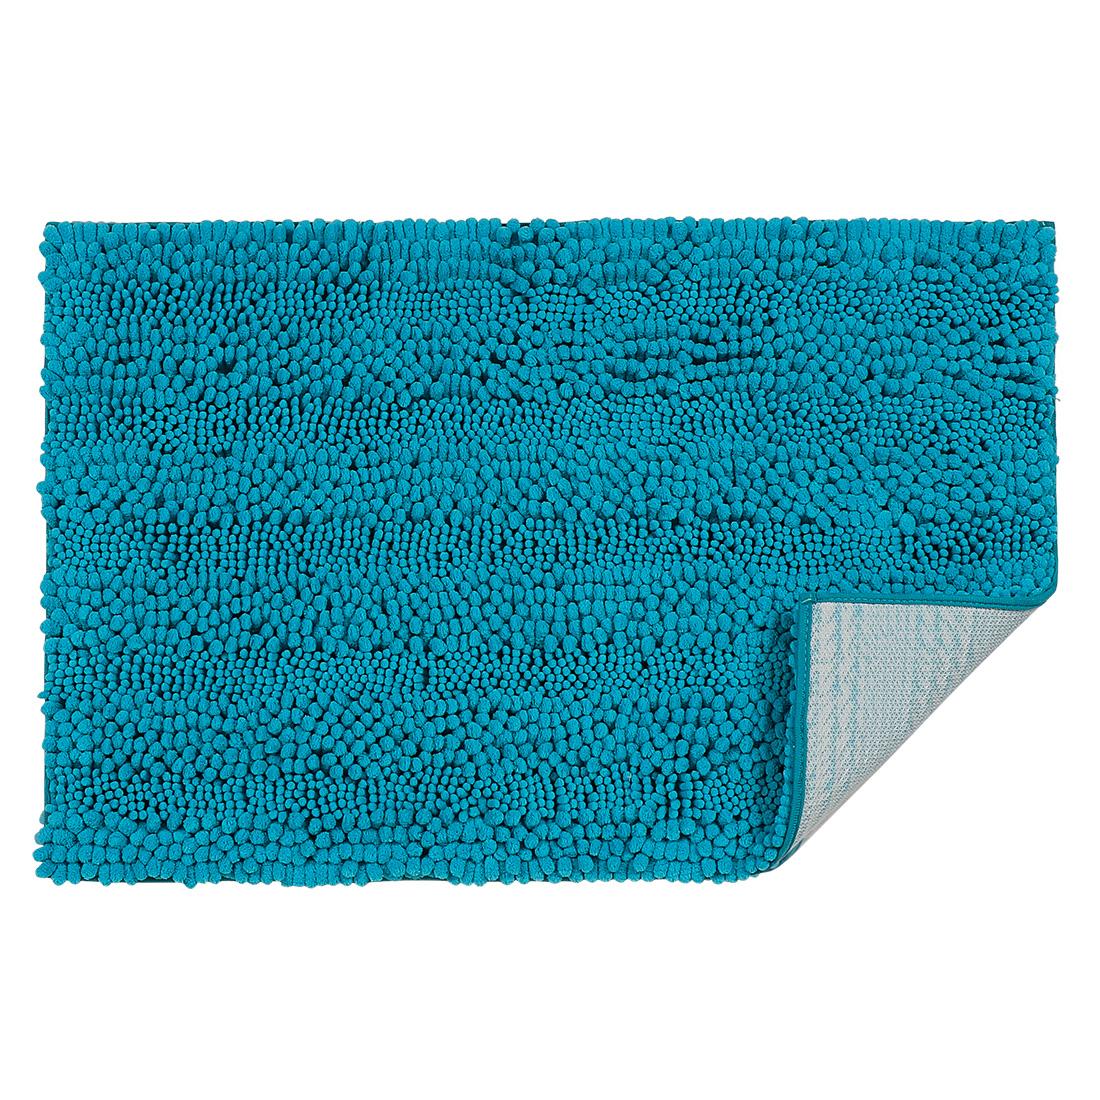 20 x 32 Inch Luxury Soft Plush Shaggy Bath Mat Chenille Rug Carpet Blue